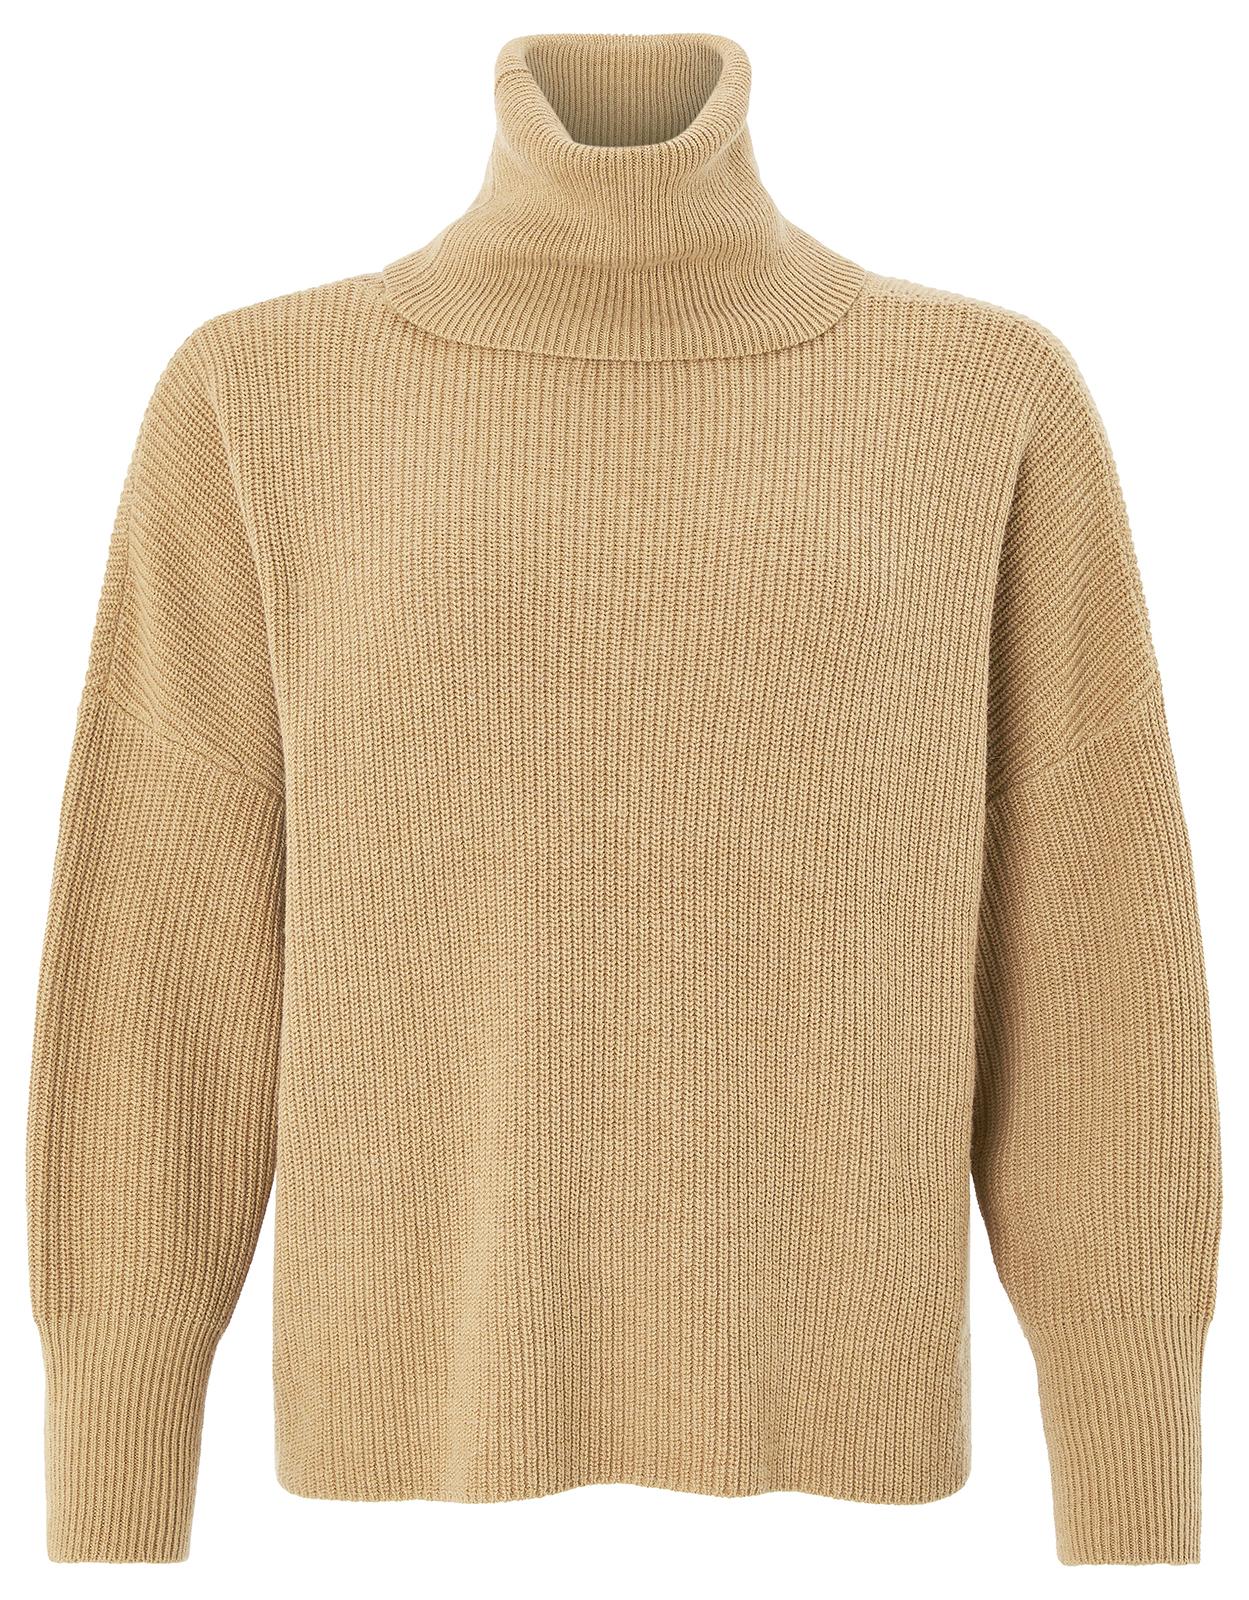 Mali knitted jumper, £49, Monsoon